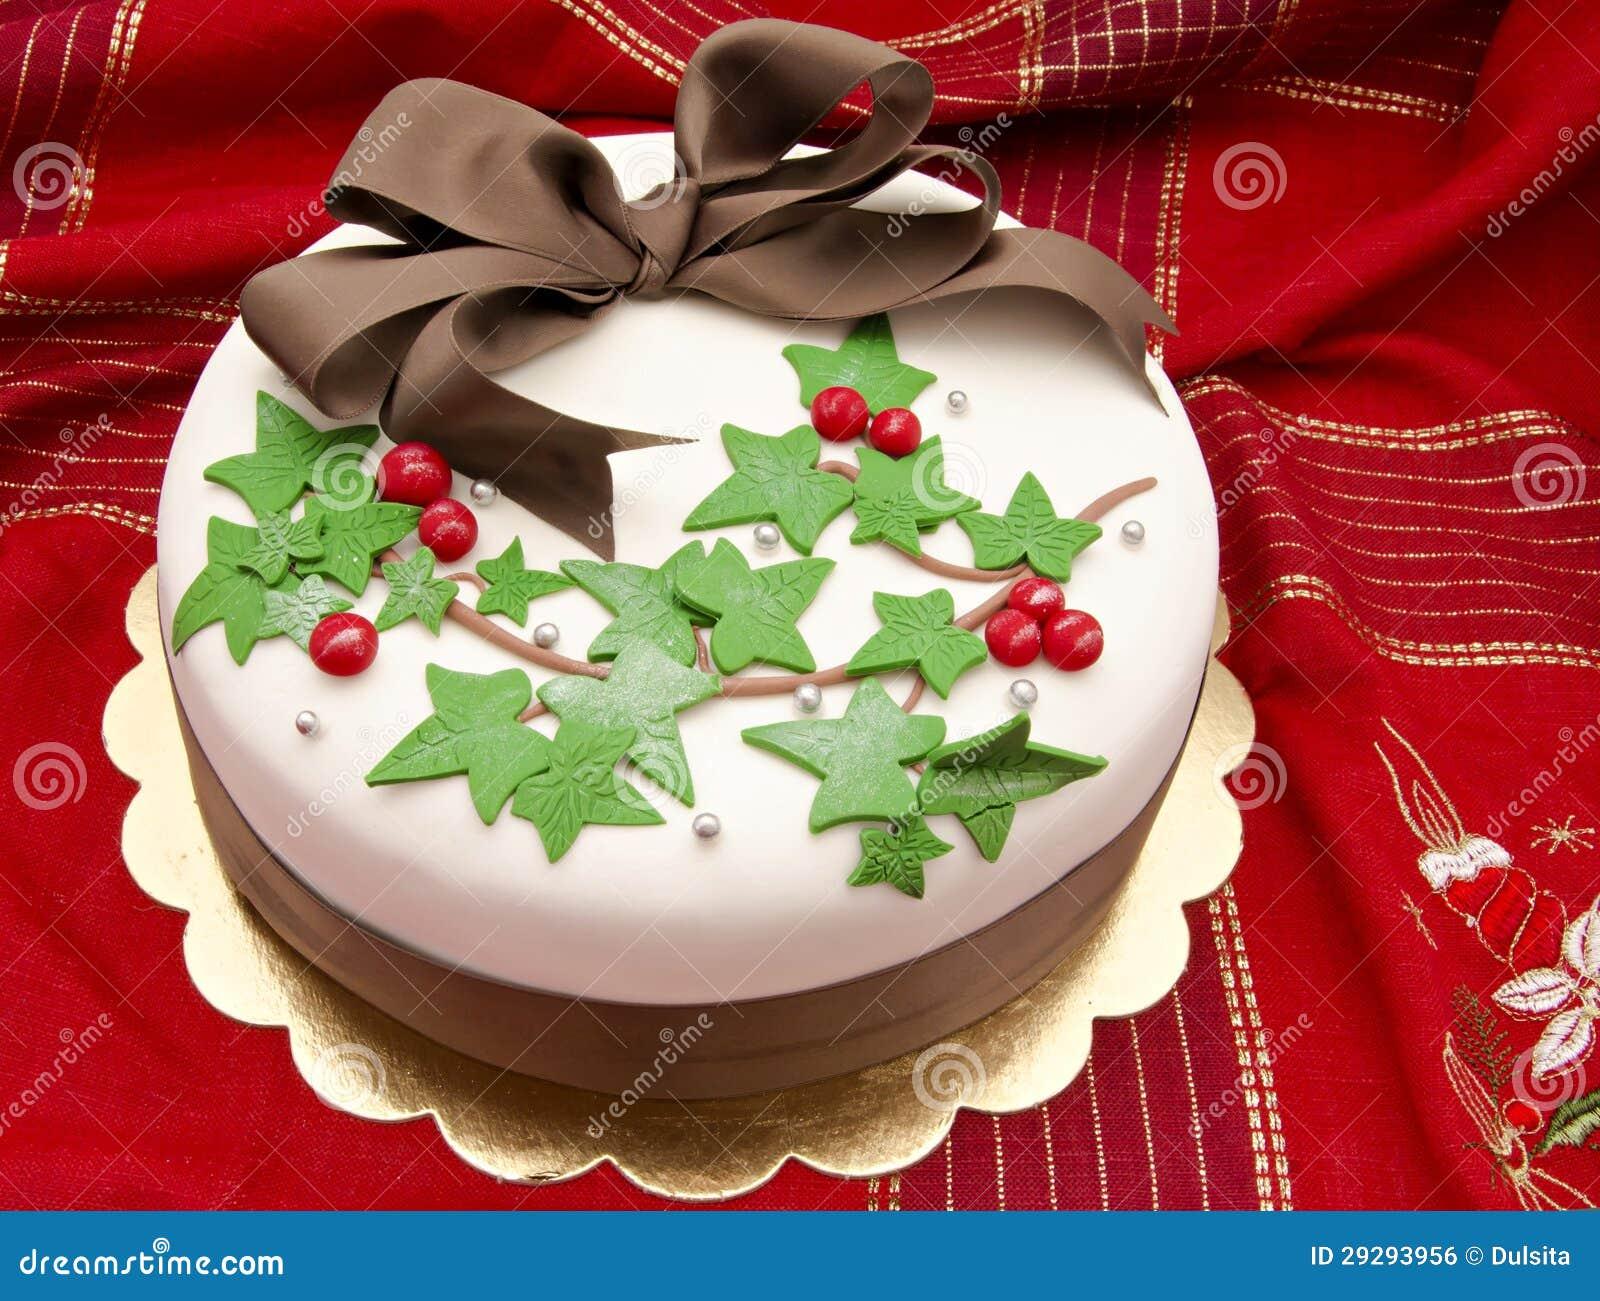 Dolce di natale immagine stock libera da diritti - Decorazioni torte natalizie ...